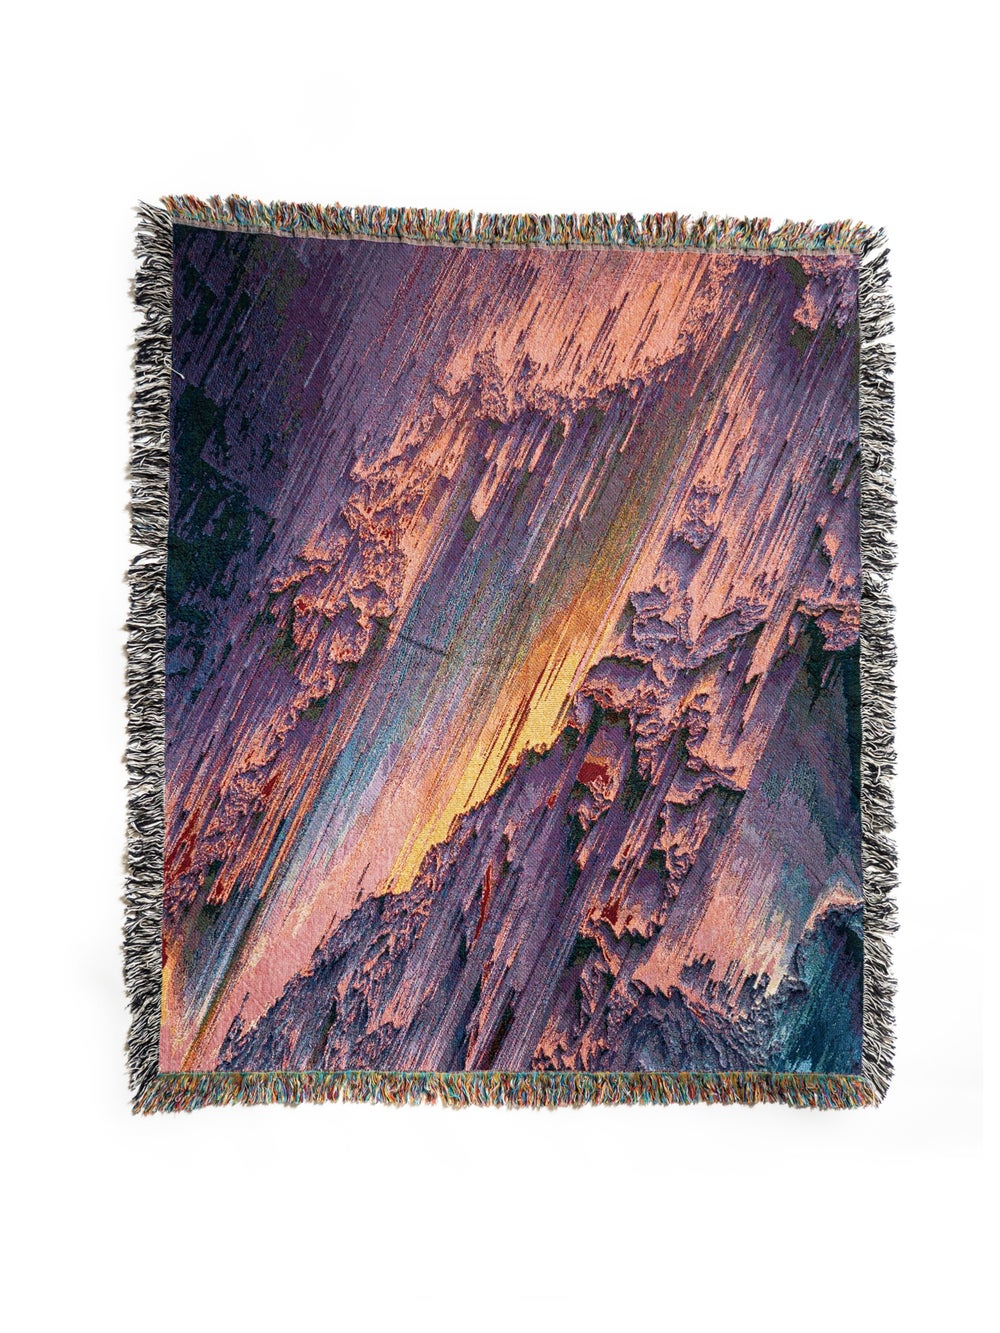 Woven Blanket #25